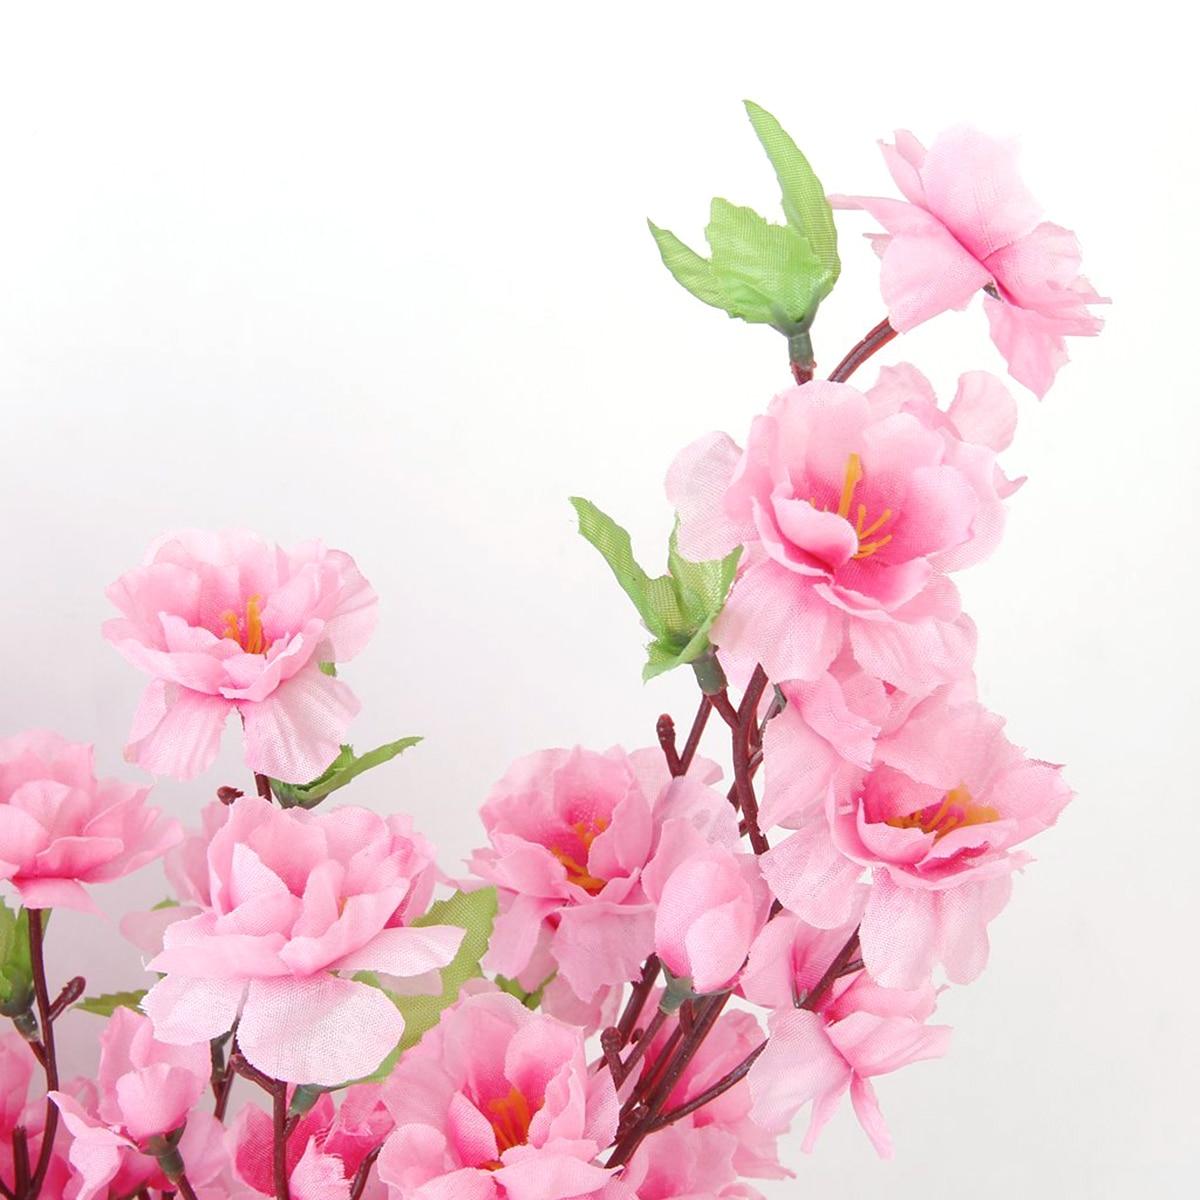 6st persika blomma simulering blommor konstgjorda blommor siden - Semester och fester - Foto 3